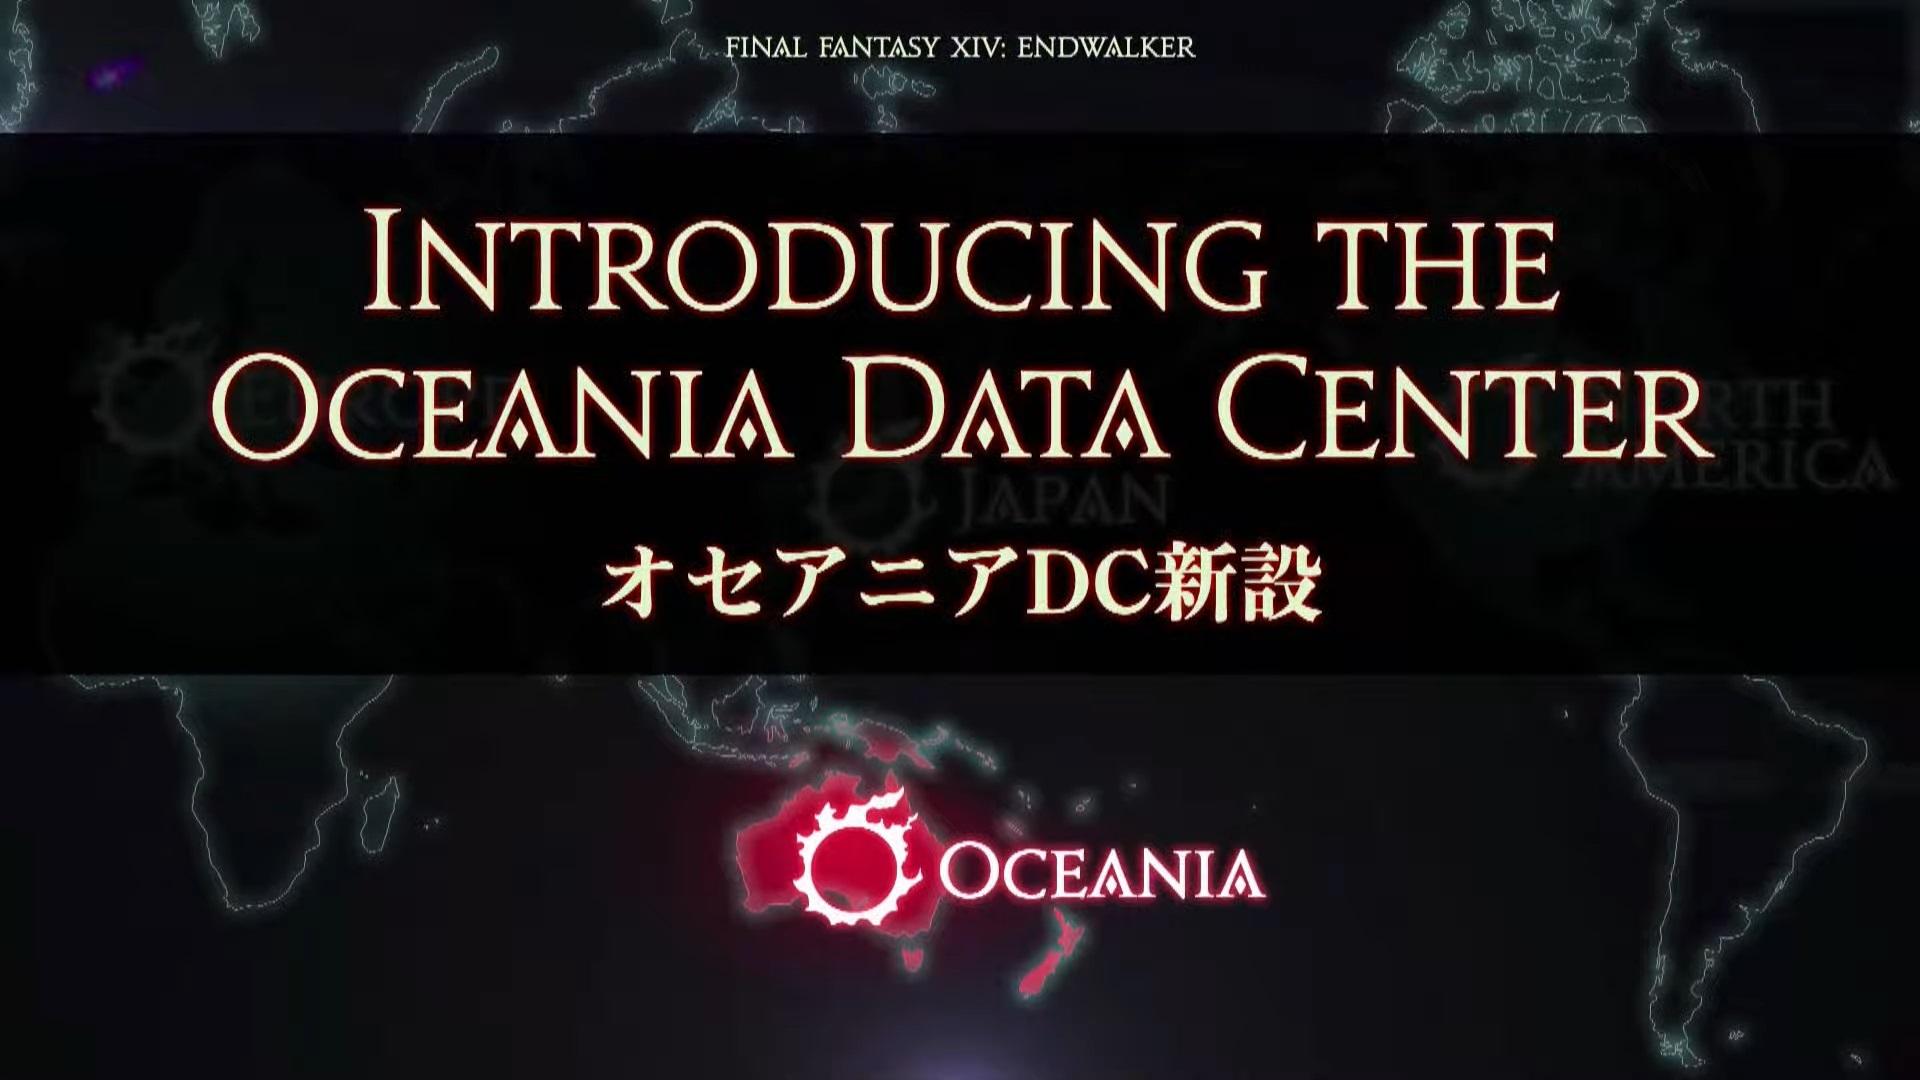 Final fantasy xiv centre de données océanie